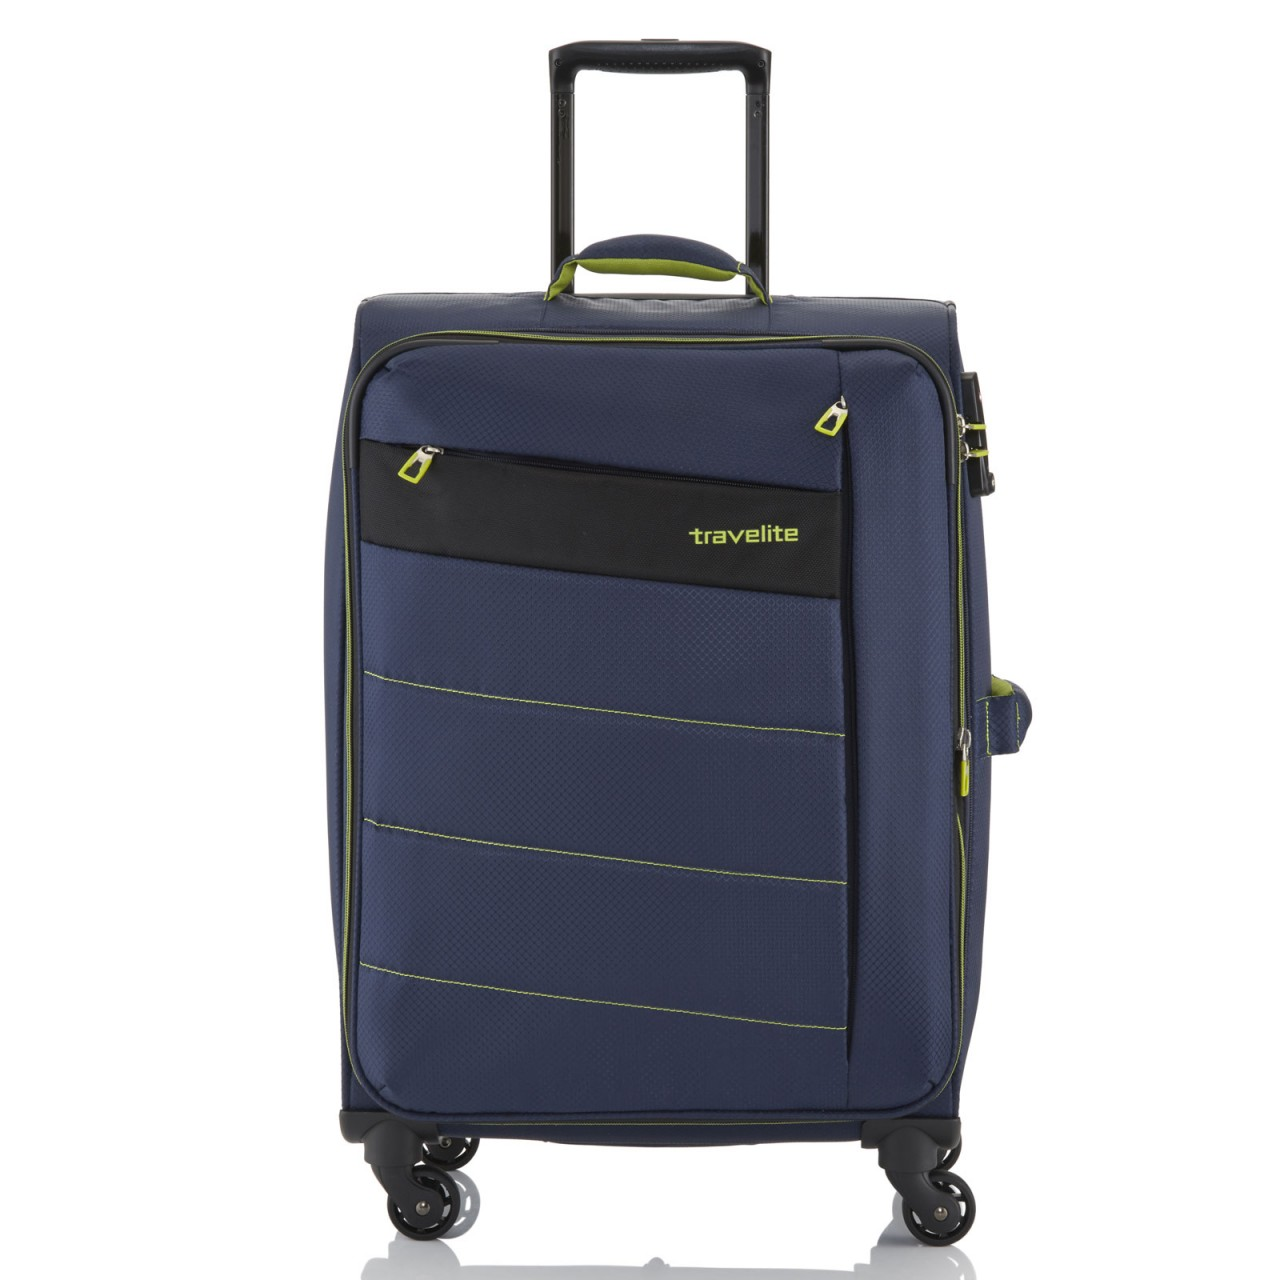 travelite kite 4 rad trolley m preisvergleich koffer. Black Bedroom Furniture Sets. Home Design Ideas